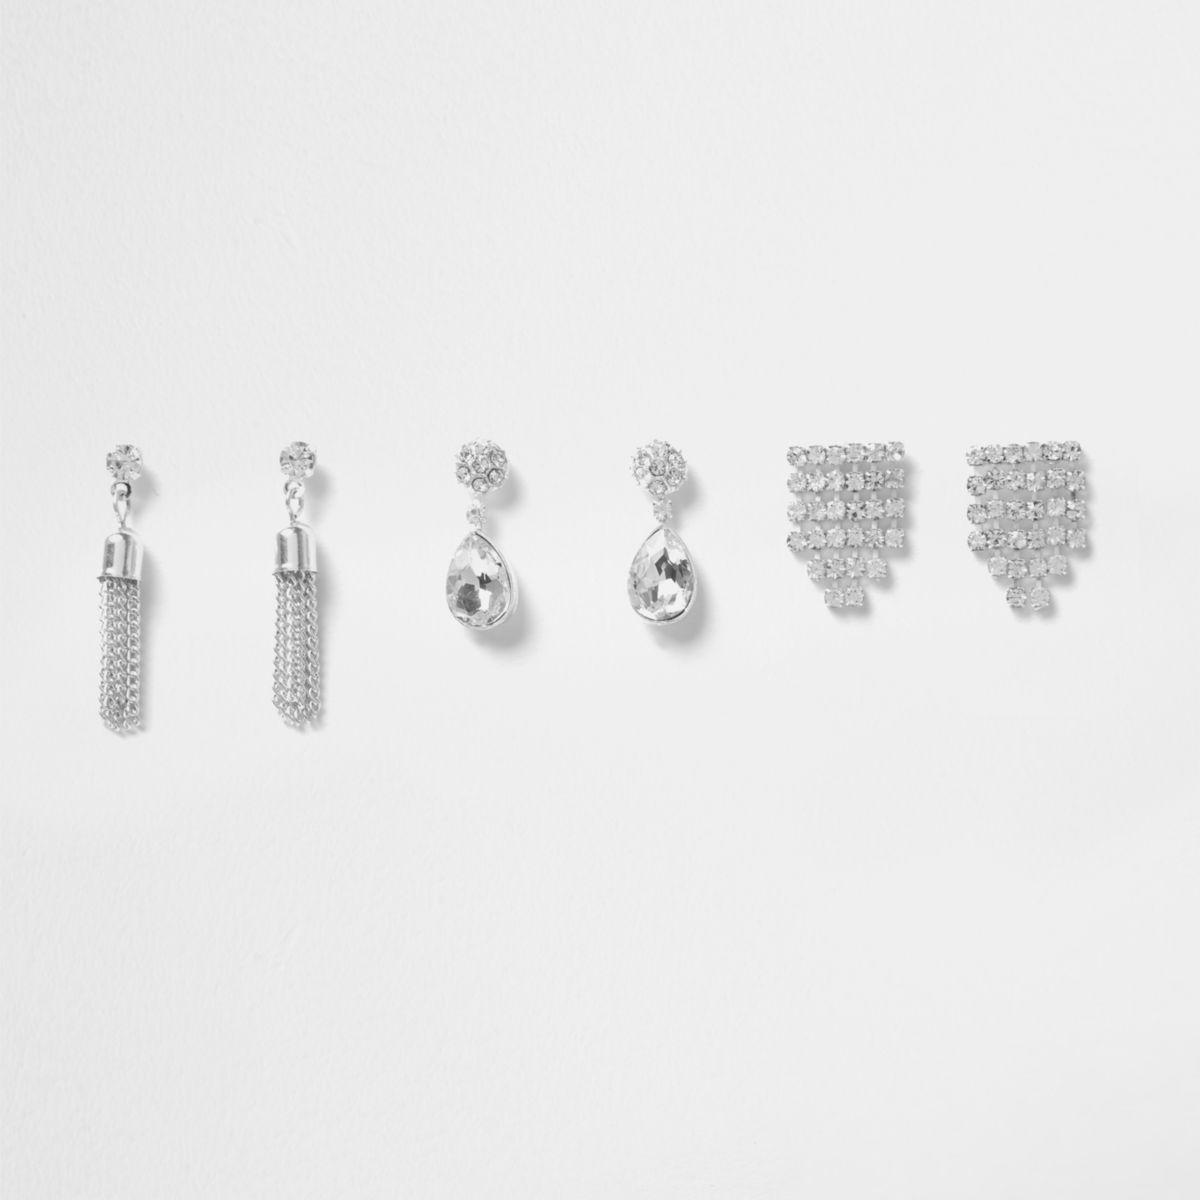 Silver tone rhinestone drop earrings pack